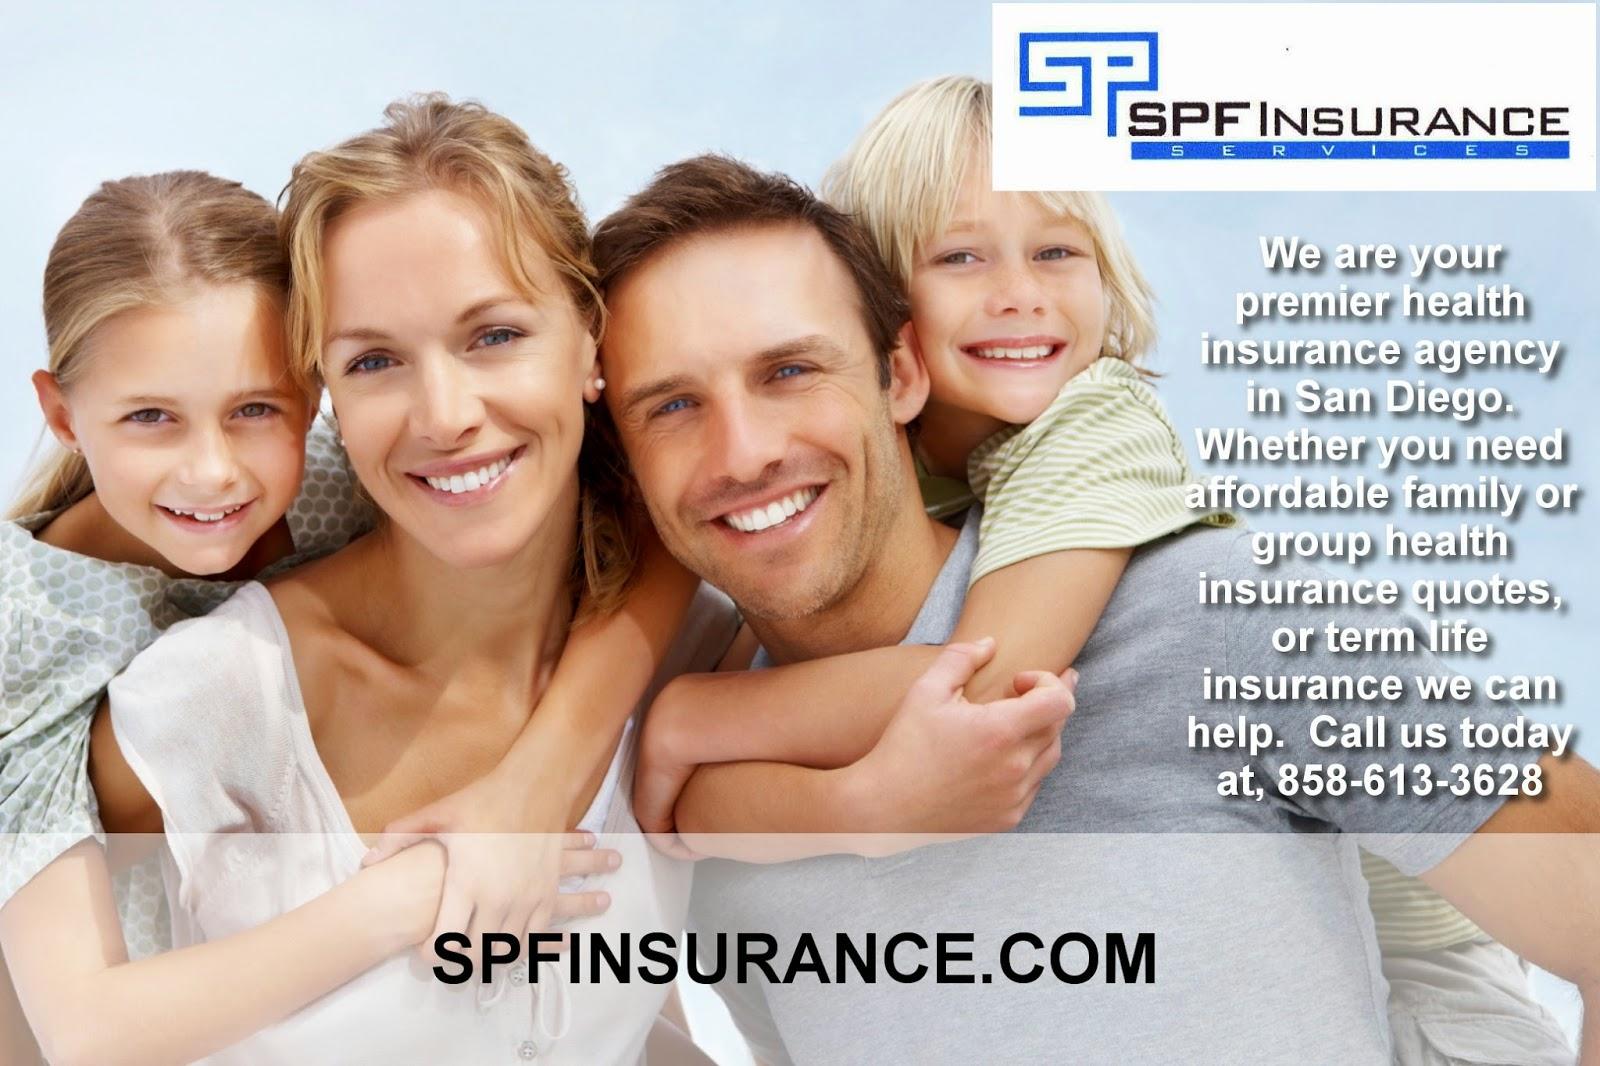 California Health Insurance Quotes